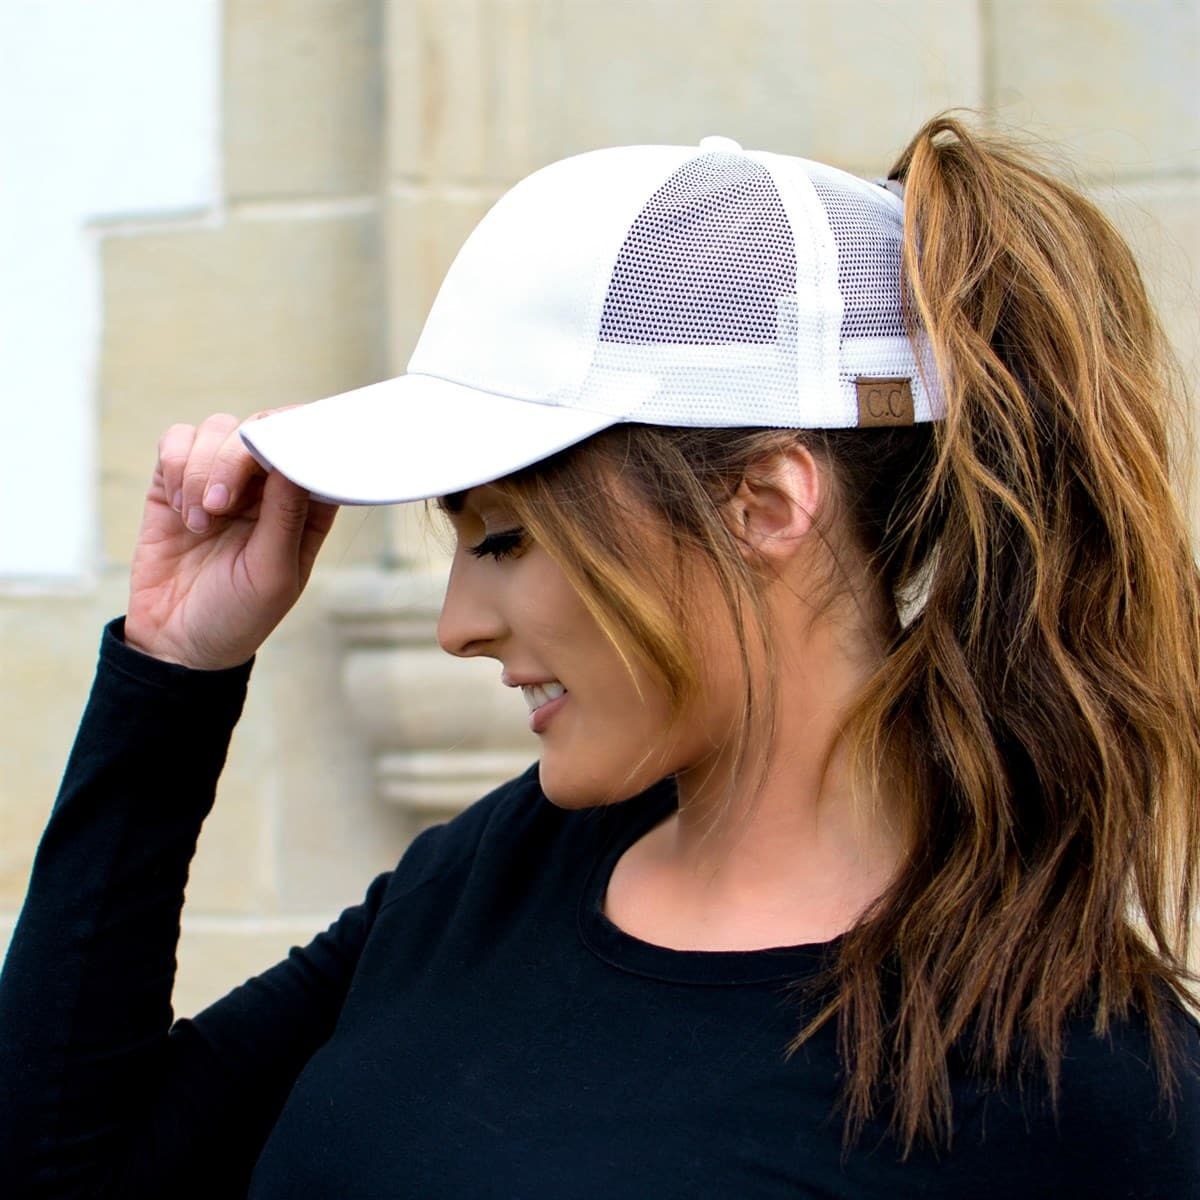 C C Top Knot Trucker Hats Baseball Hat Hairstyles Hat Hairstyles Baseball Hats